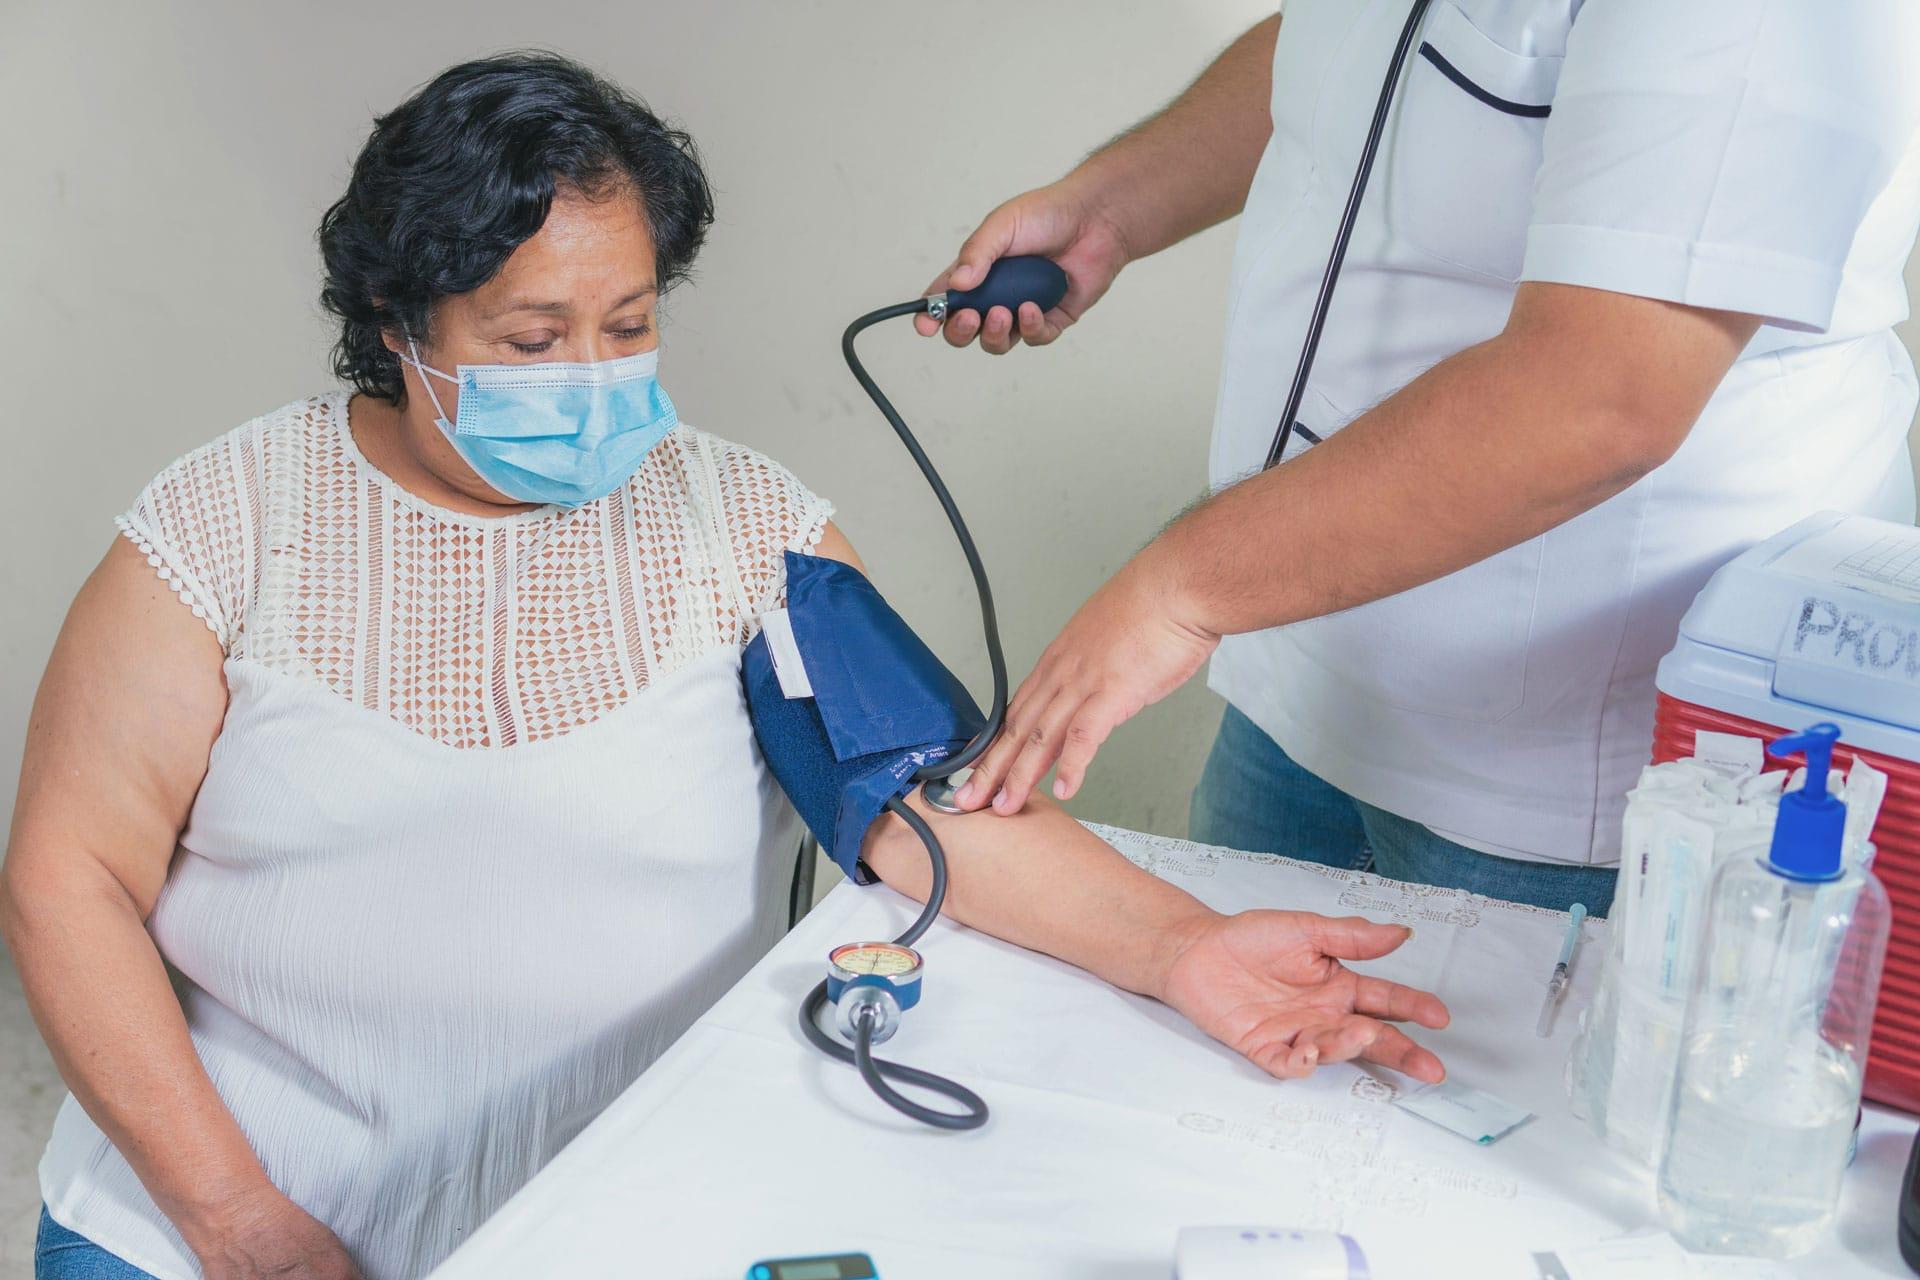 Skilled nursing professional taking patient vitals